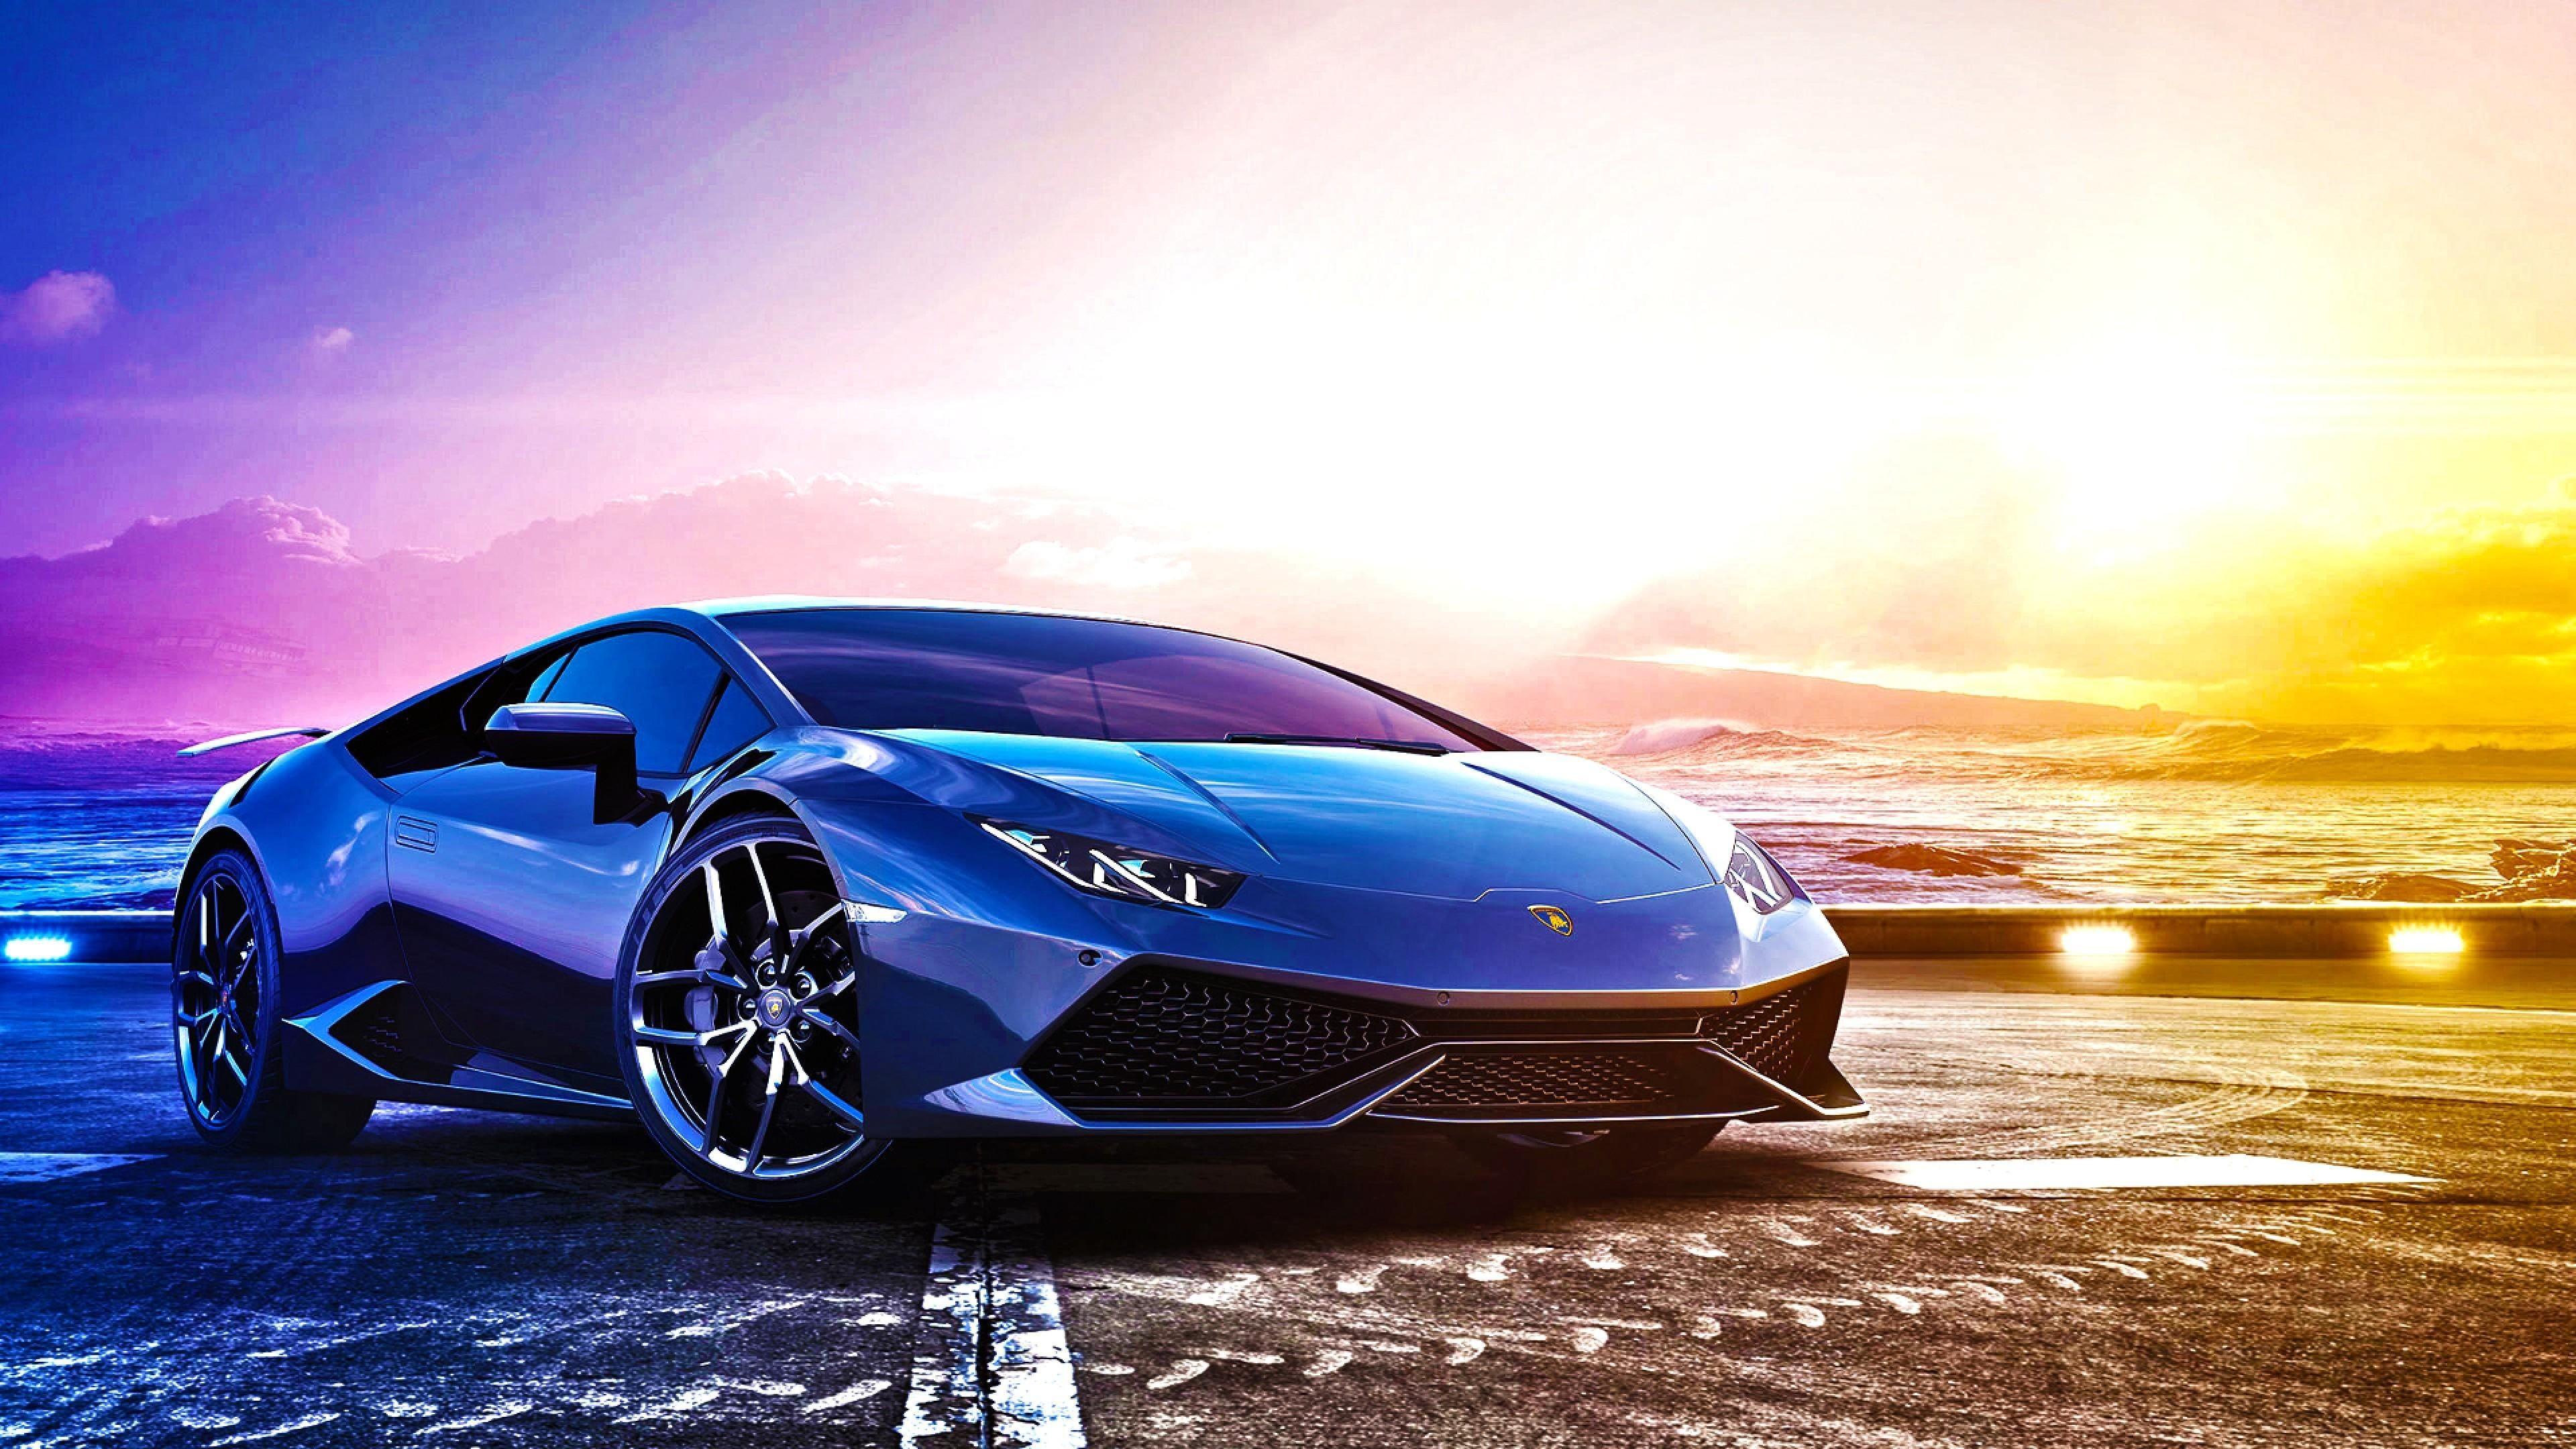 Lamborghini Aventador Wallpaper 76 Pictures